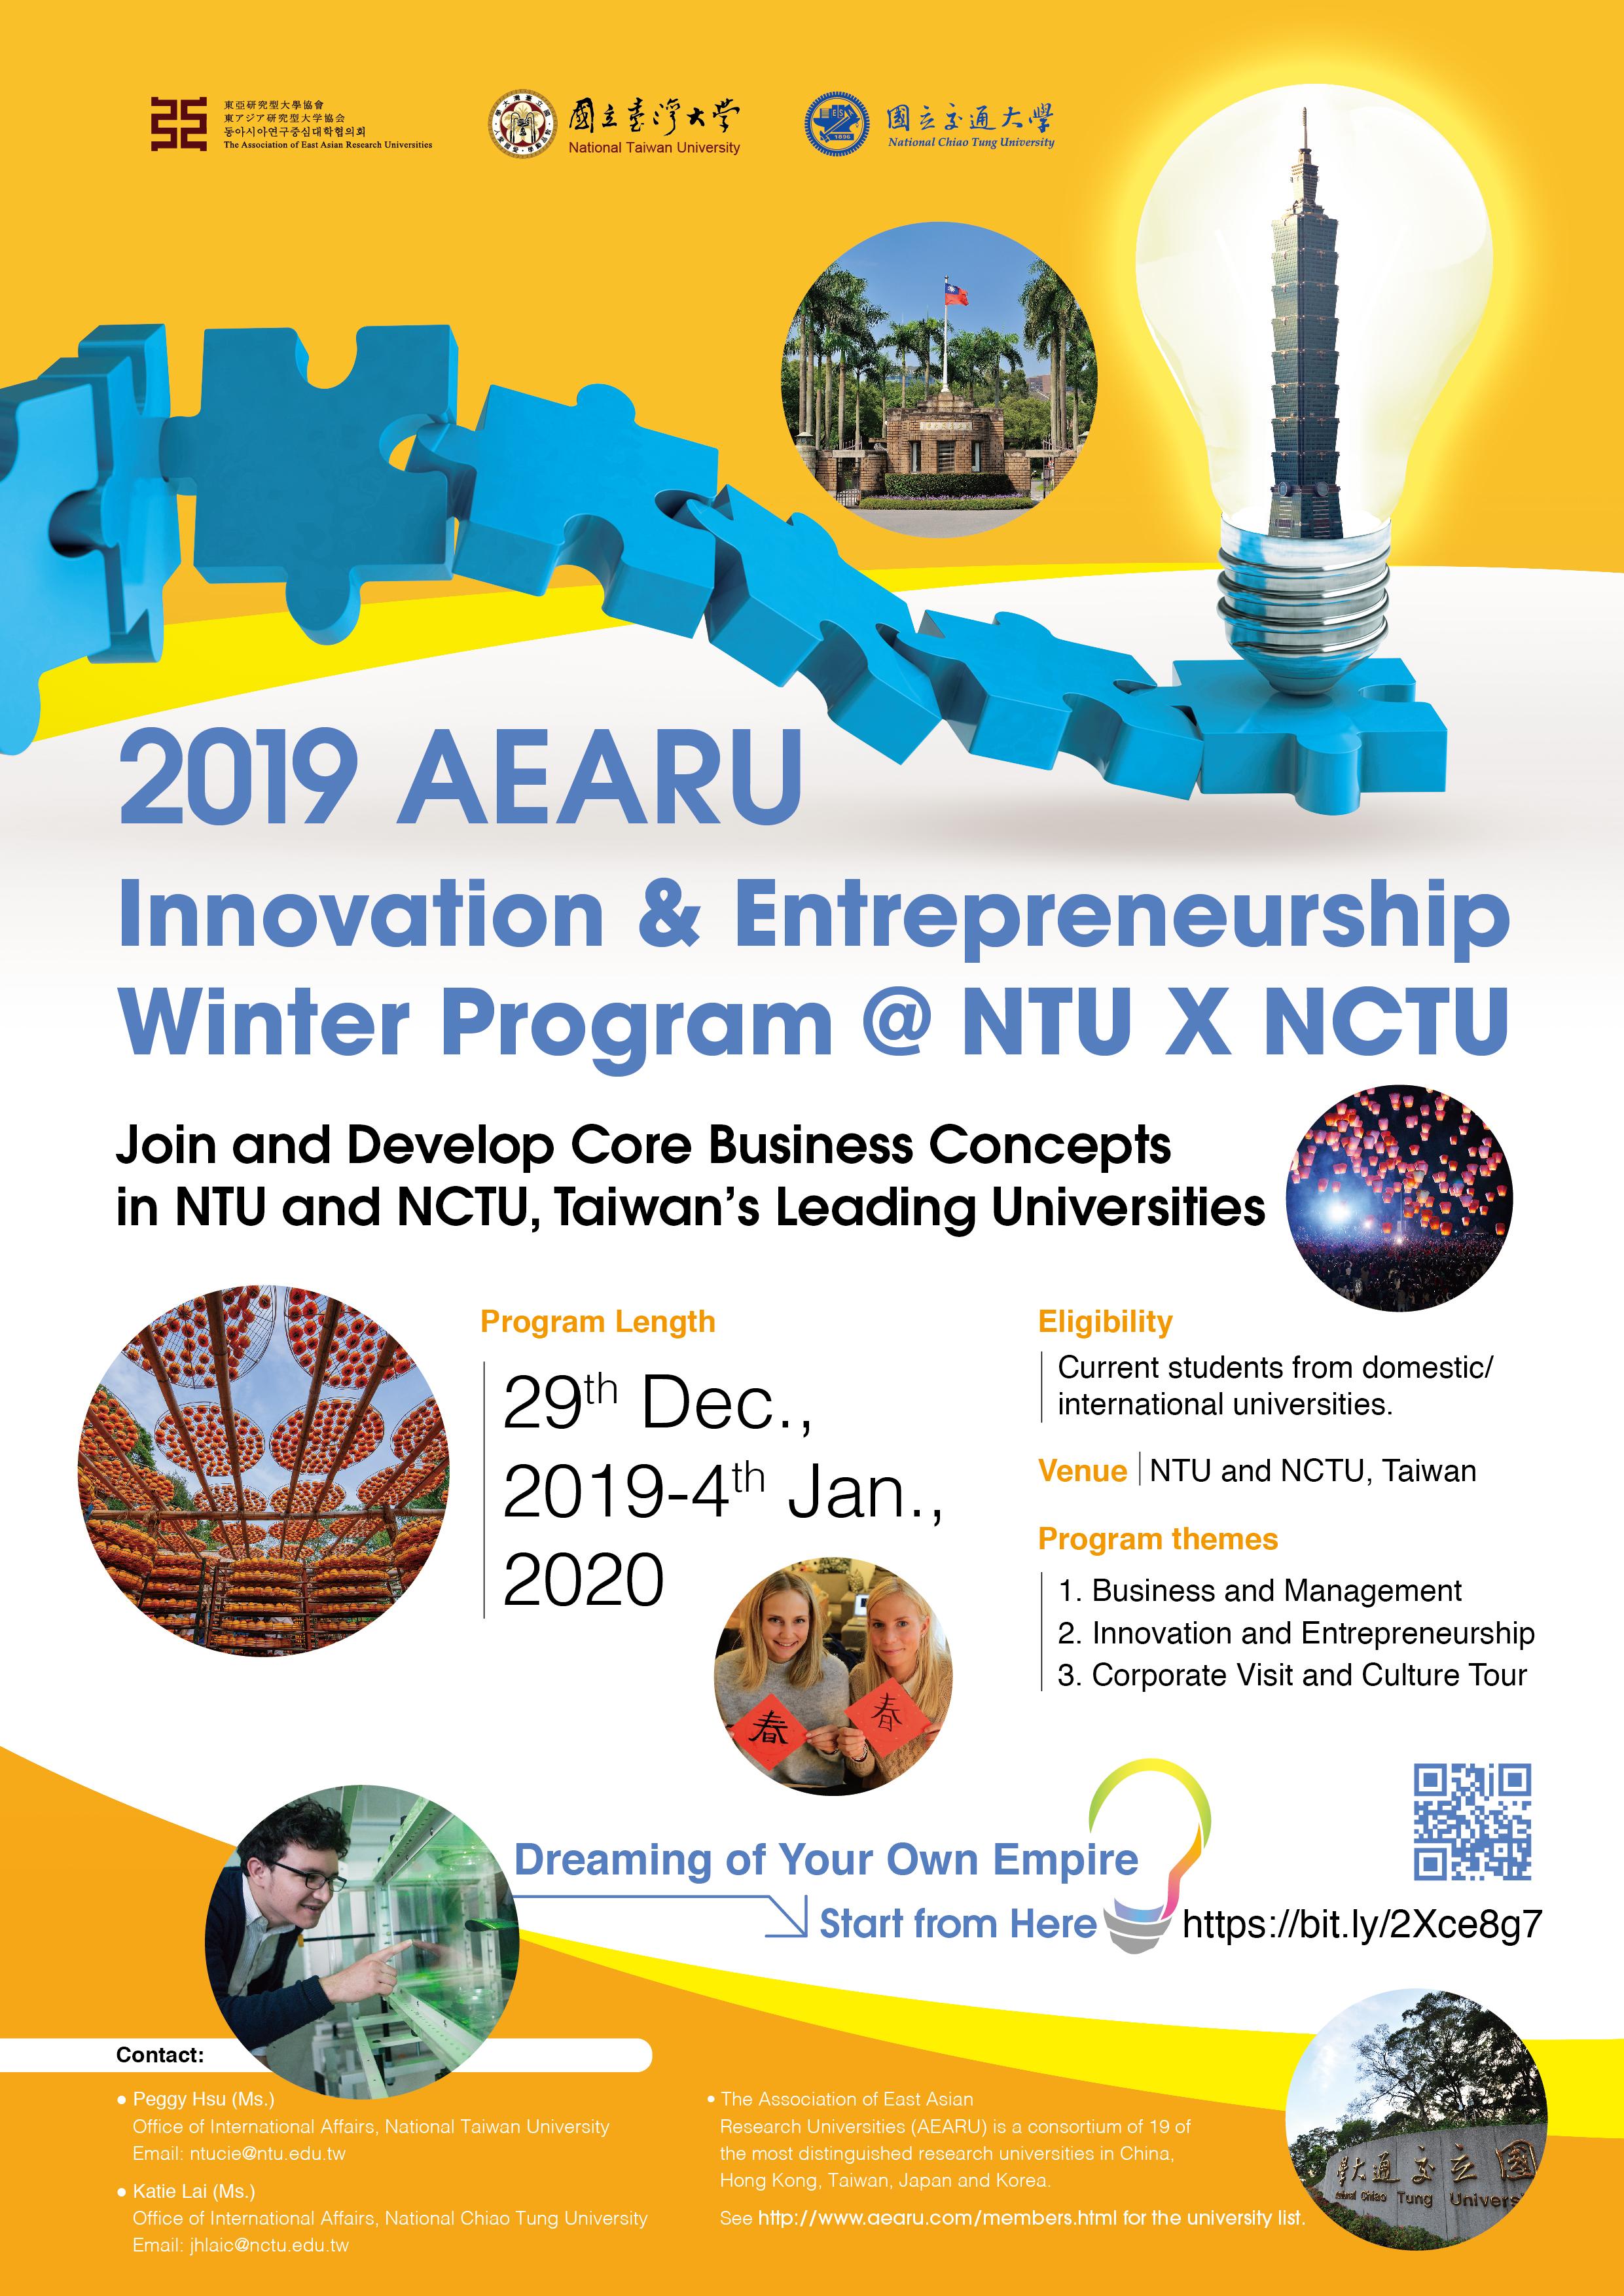 2019 AEARU Innovation & Entrepreneurship Winter Program@NTU